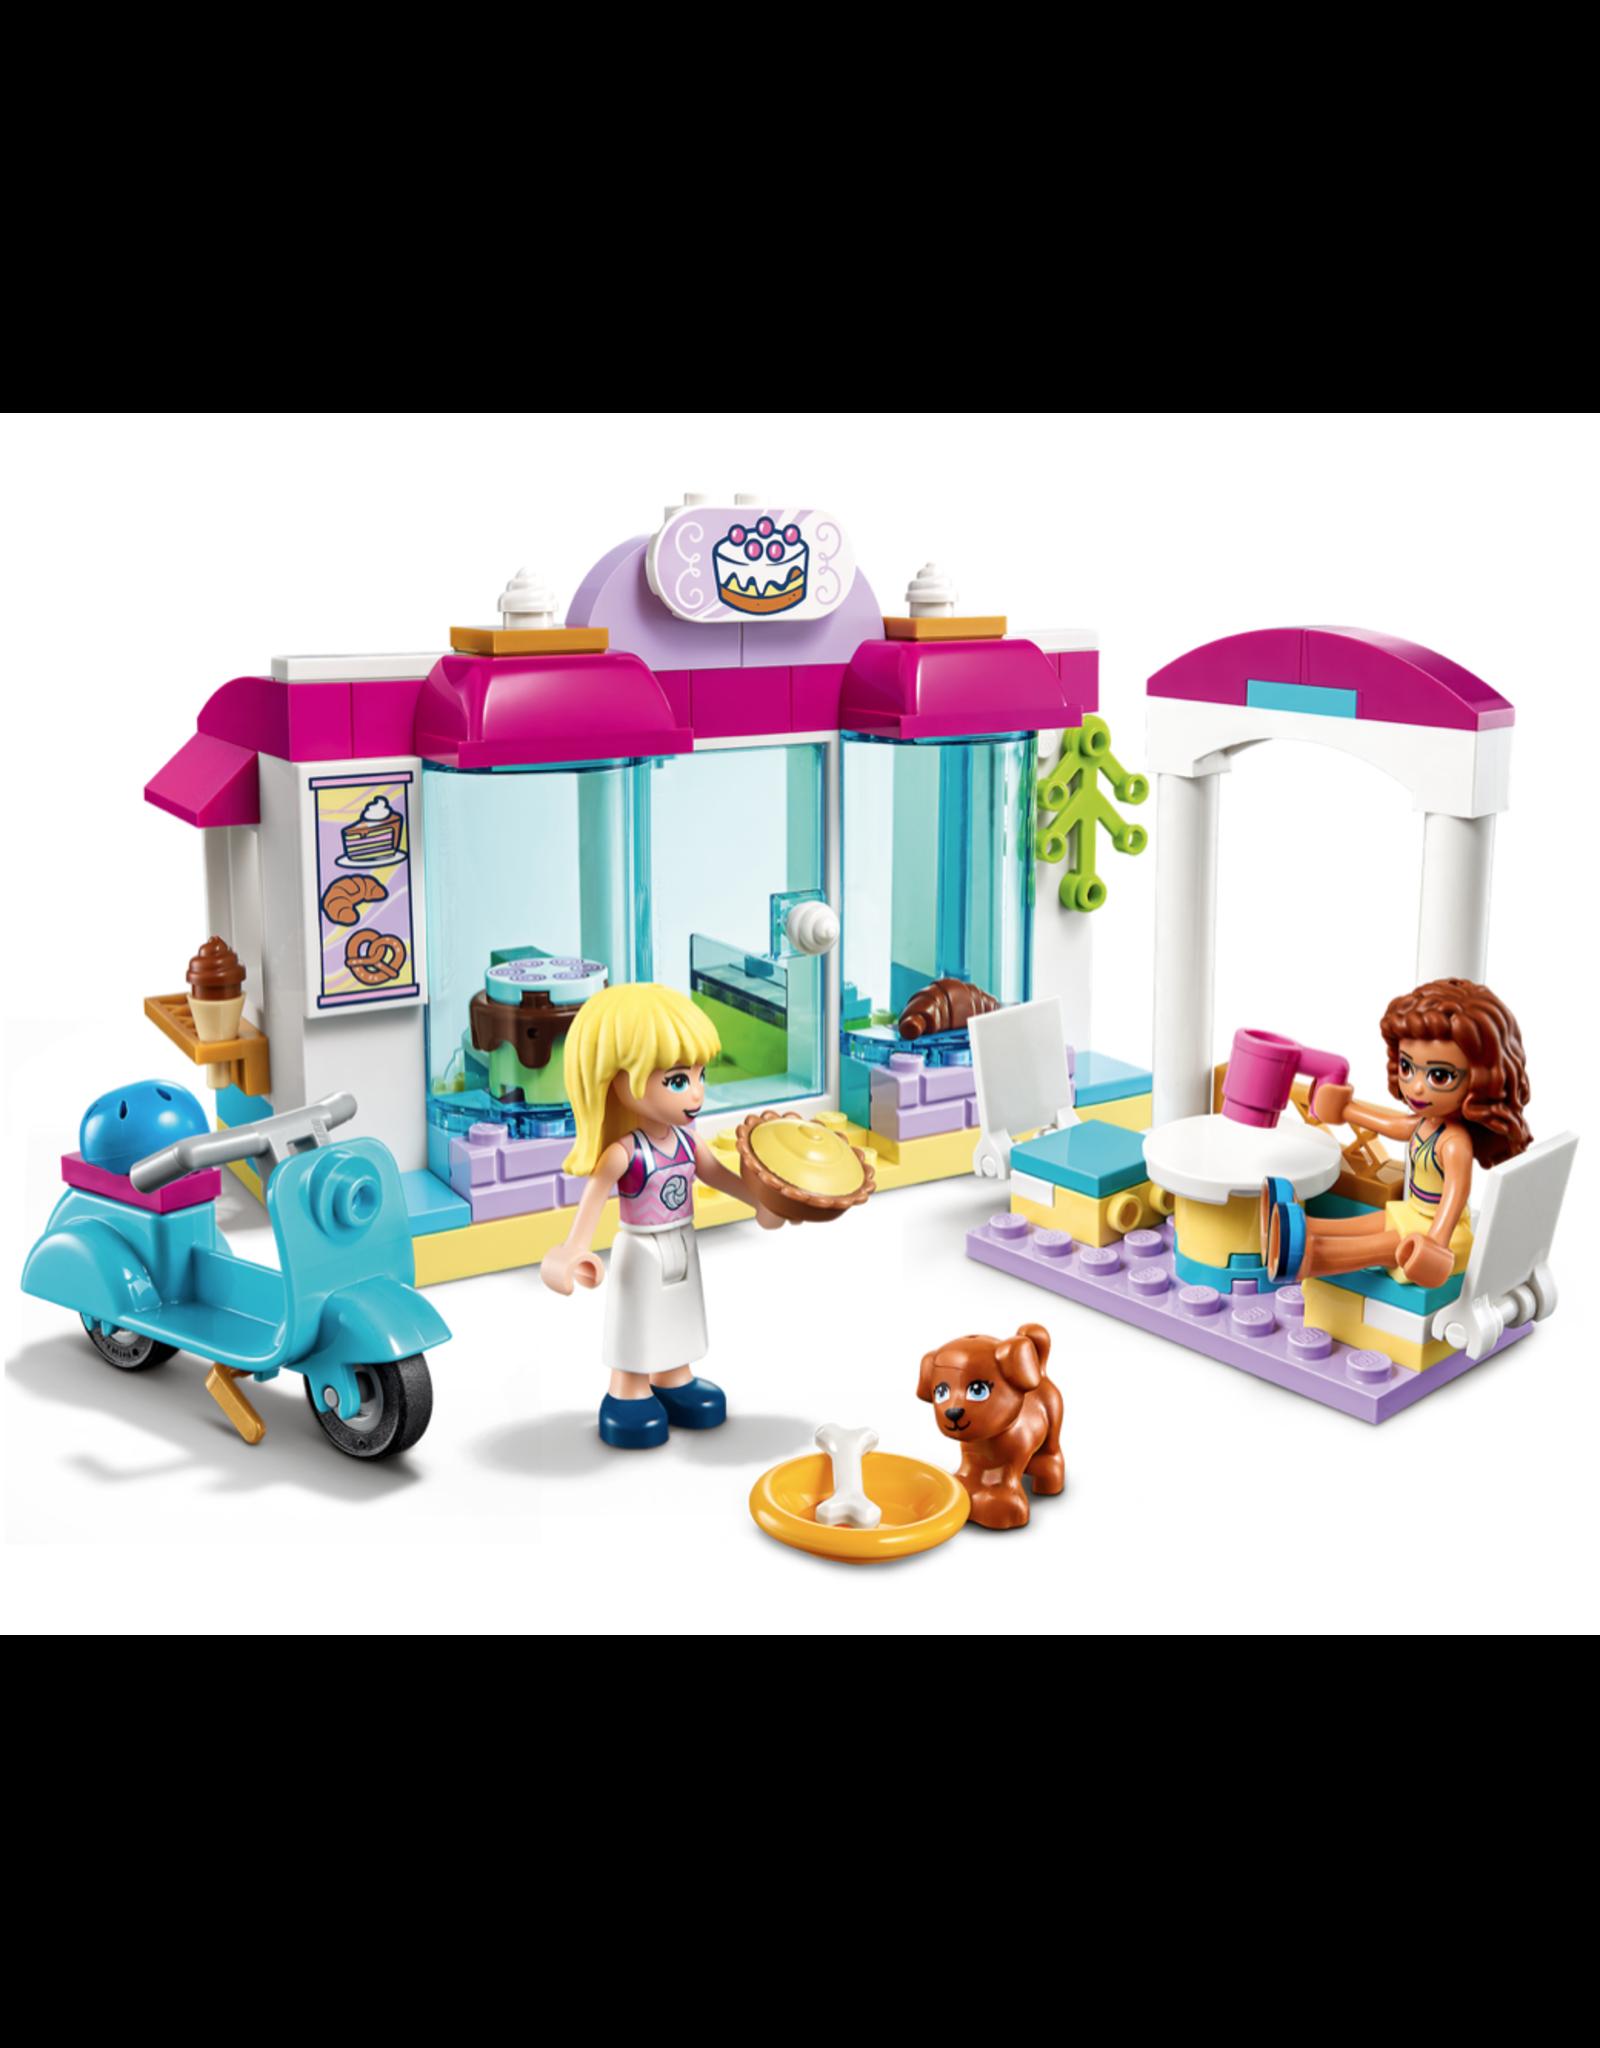 LEGO® LEGO® Friends Heartlake City Bakery